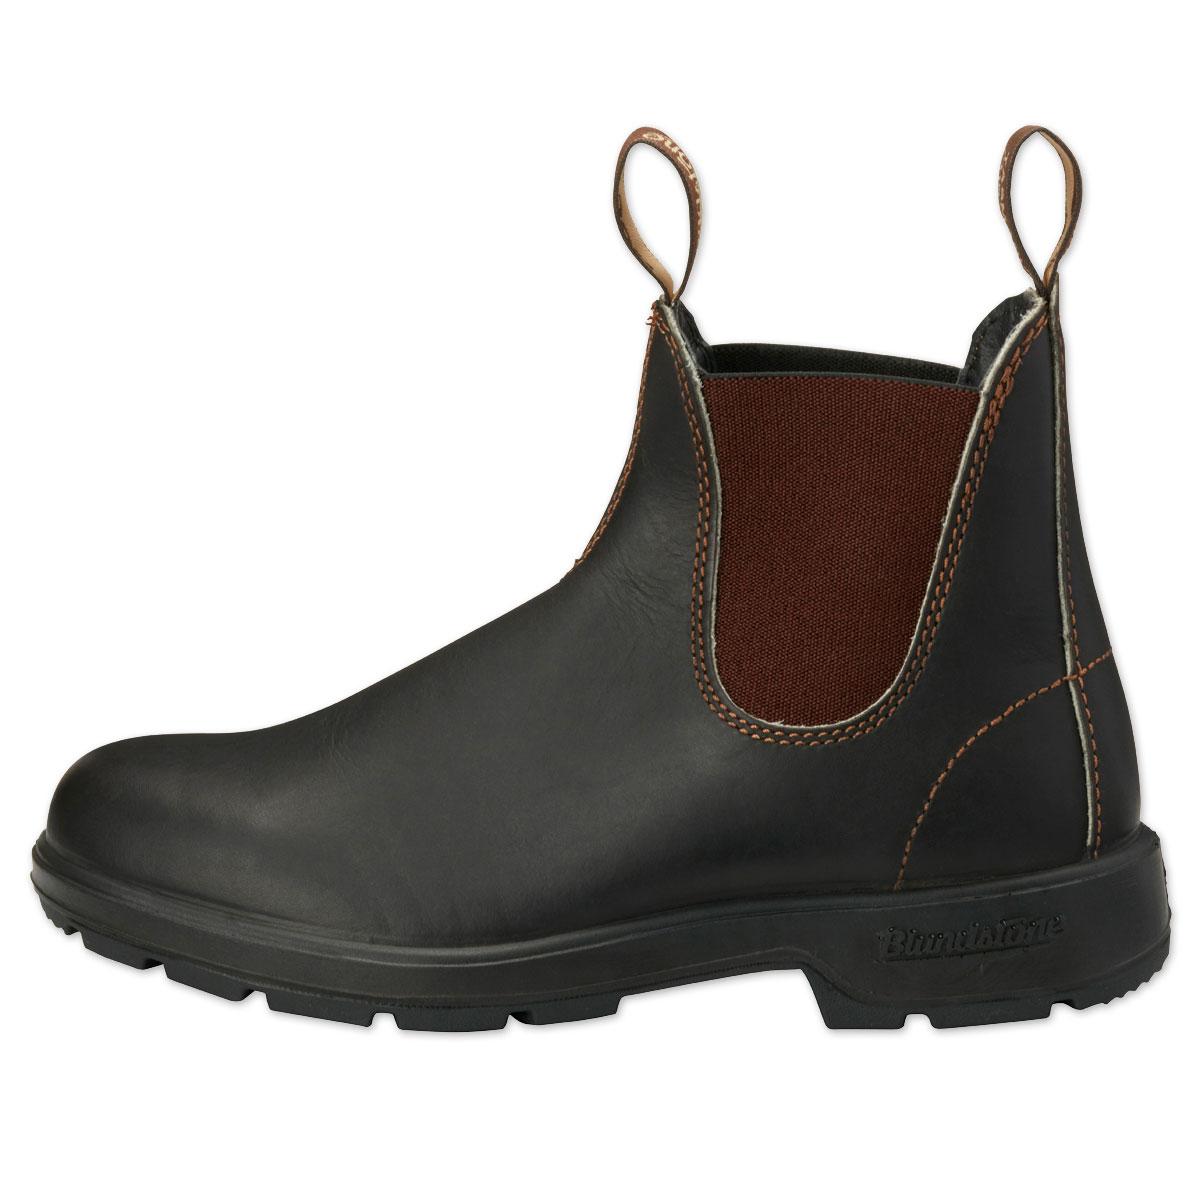 Blundstone Original 500 Series Boot